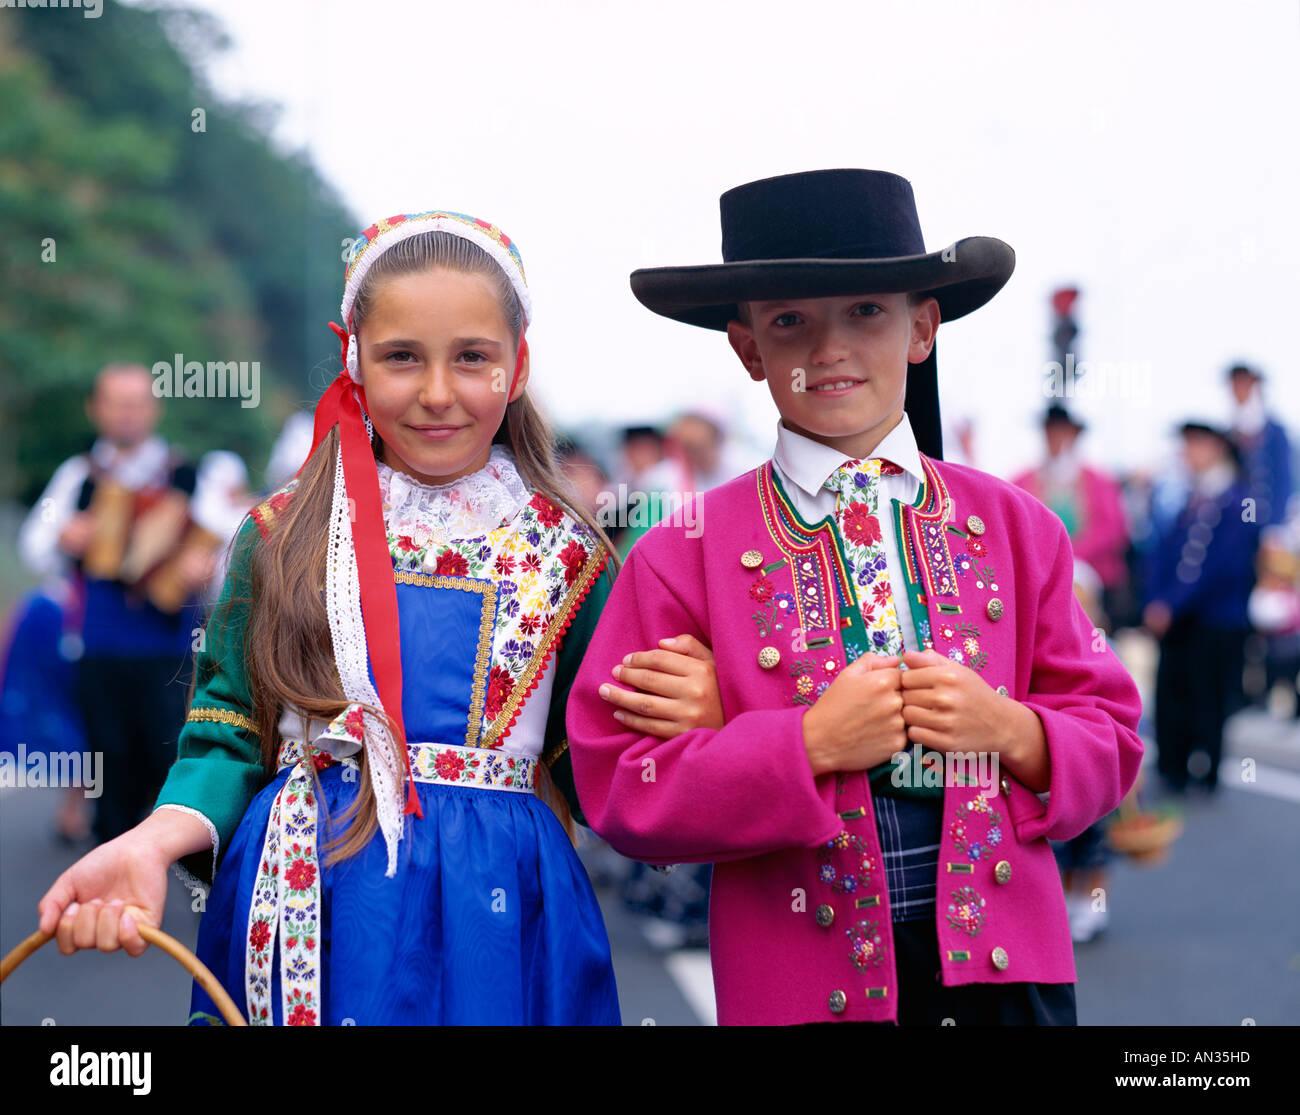 Breton Traditional Dress Girl Amp Boy In Local Costume